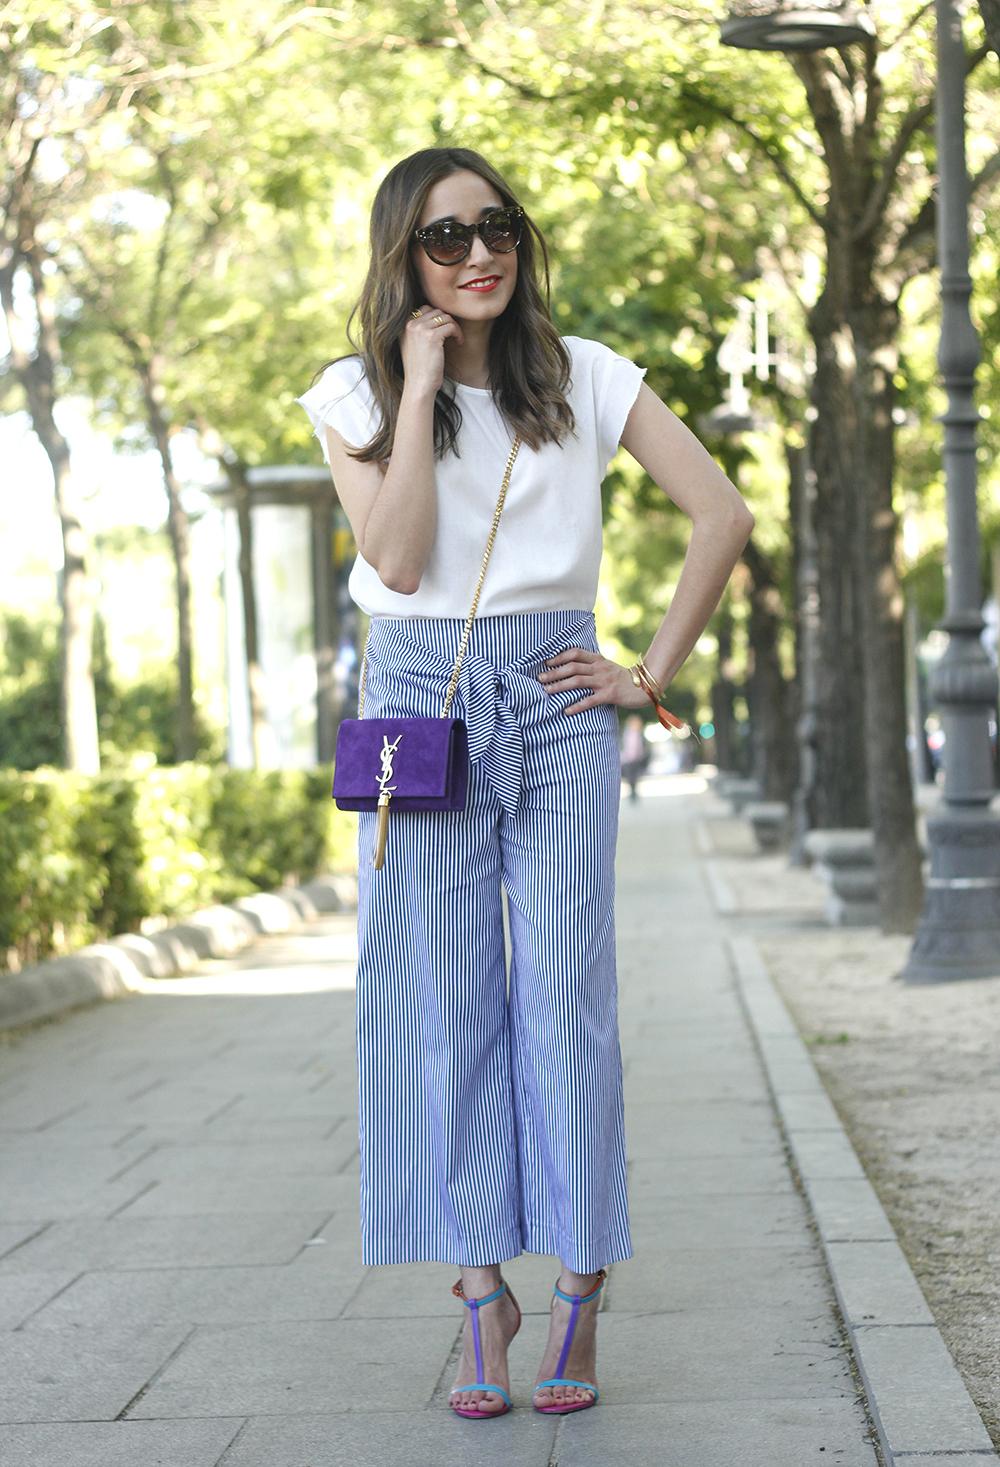 striped pants with bow white shirt carolina herrera sandasl saint laurent bag accessories summer outfit04